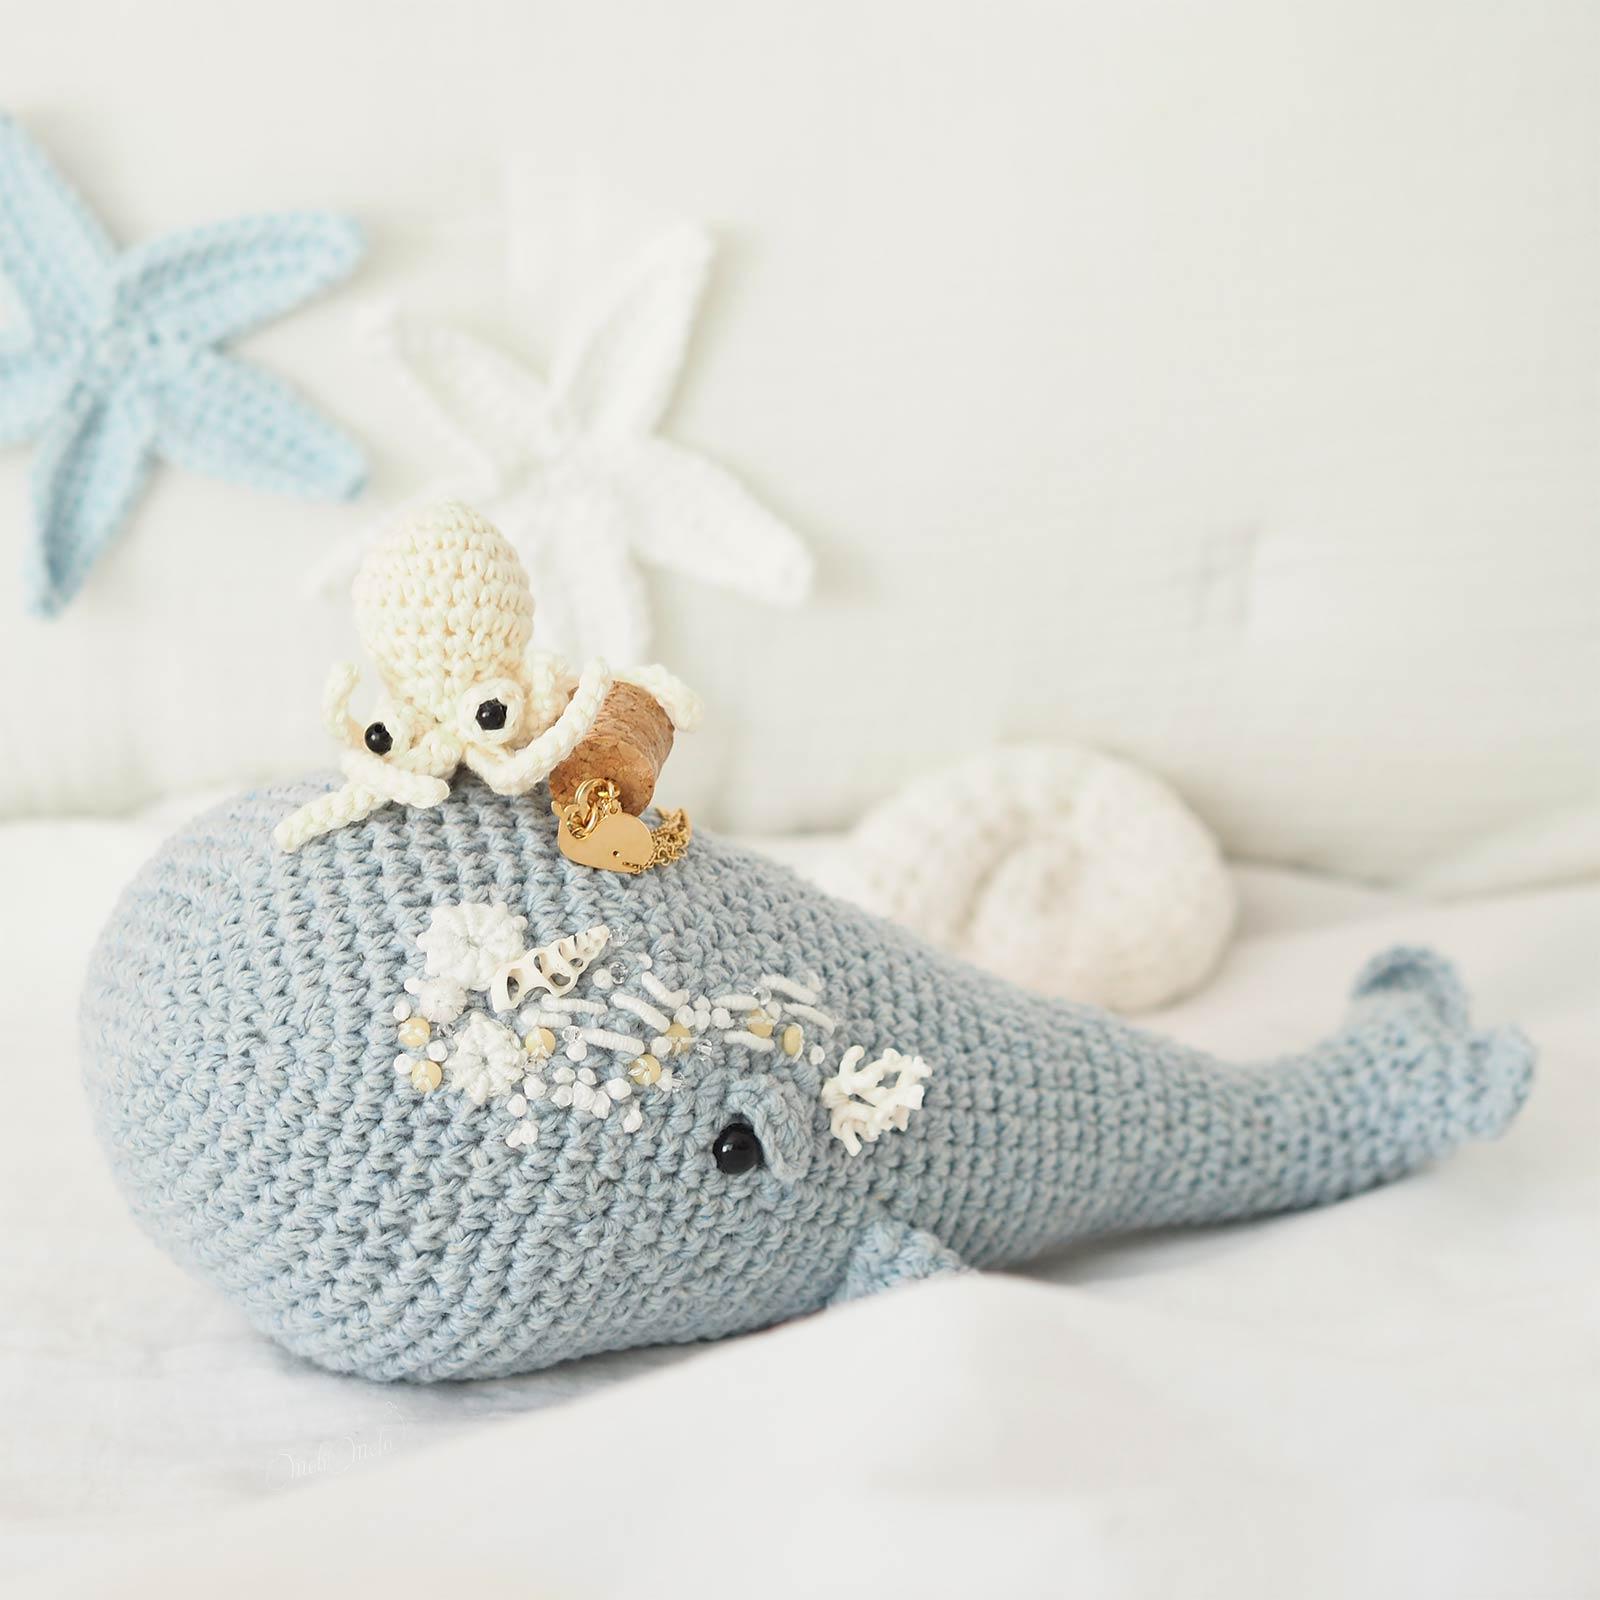 doudou-amigurumi-crochet-baleine-poulpe-bijou-collier-shlomitofir-laboutiquedemelimelo